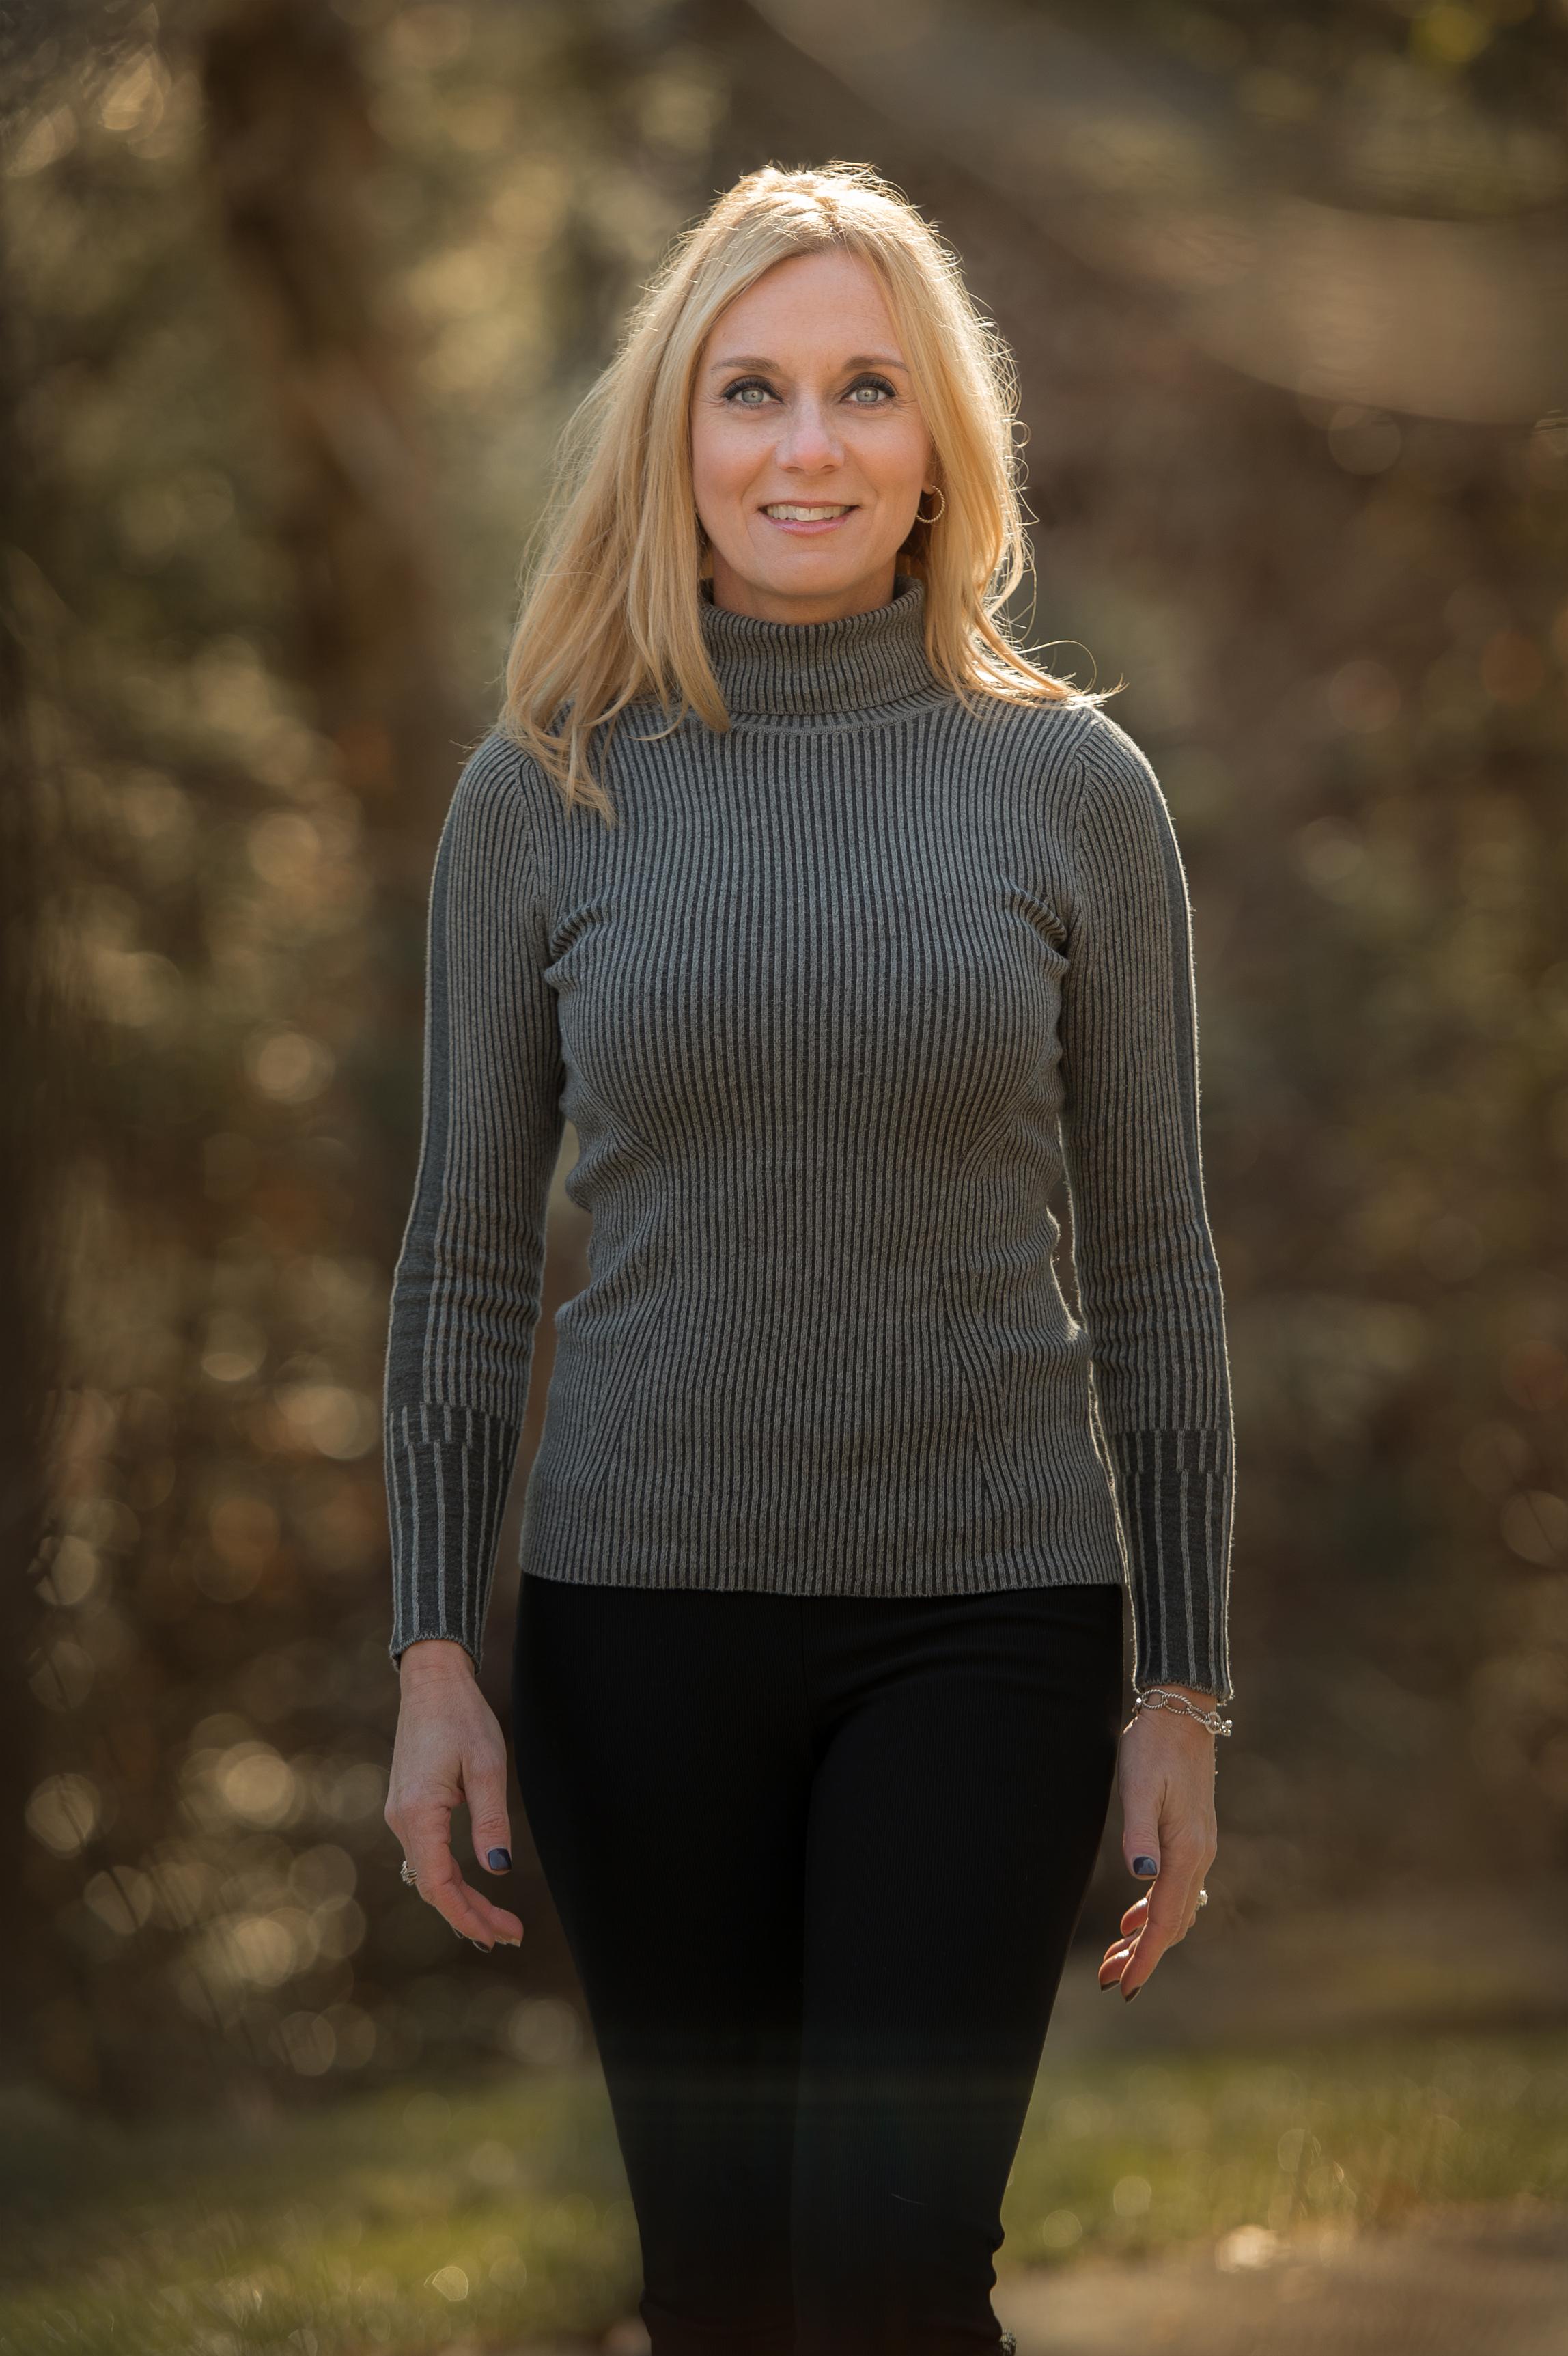 Christina Avigne - Owner & 2nd Shooter